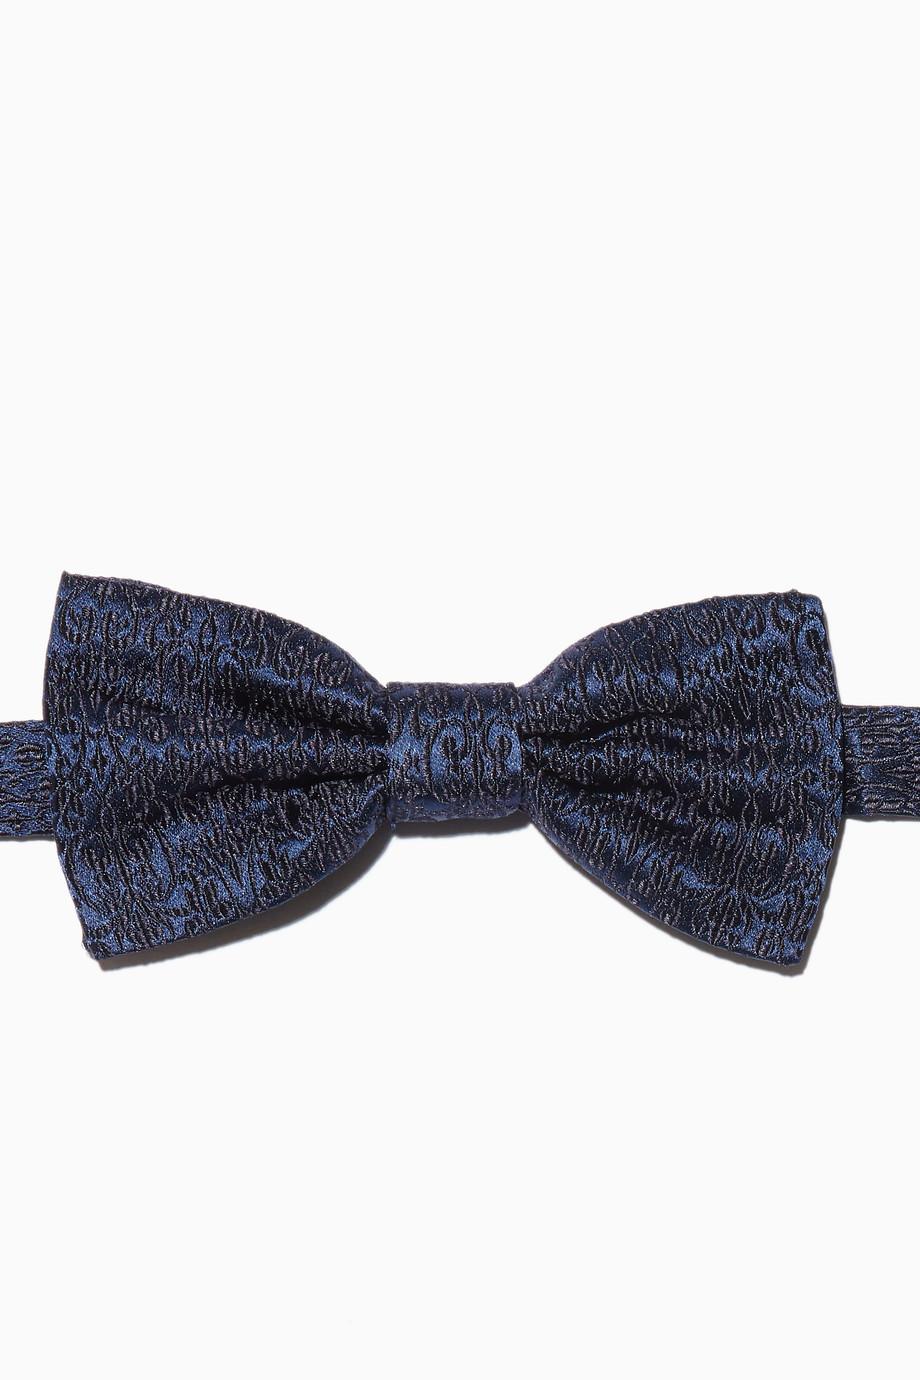 2ae3e448239d Shop Dolce & Gabbana Blue Blue Jacquard Ready-Tied Bow Tie for Men ...